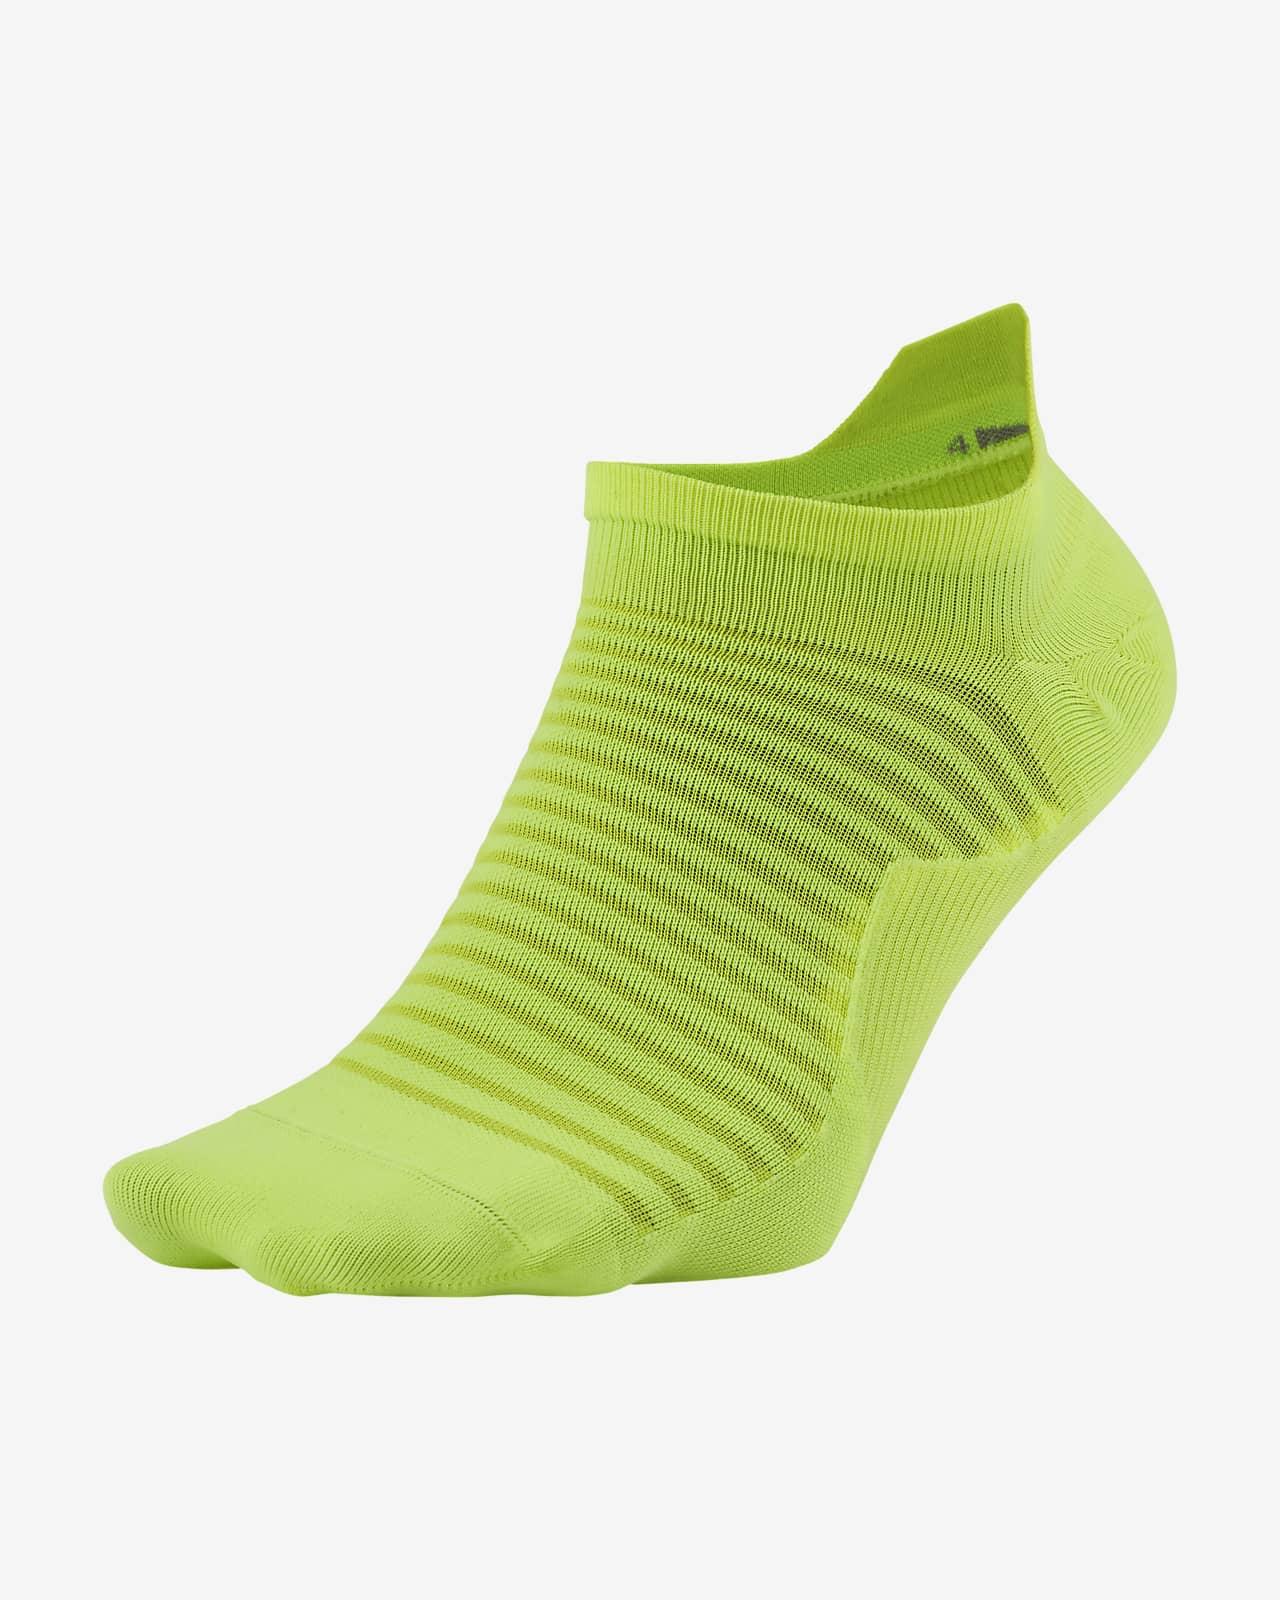 Löparstrumpor Nike Spark Lightweight No-Show